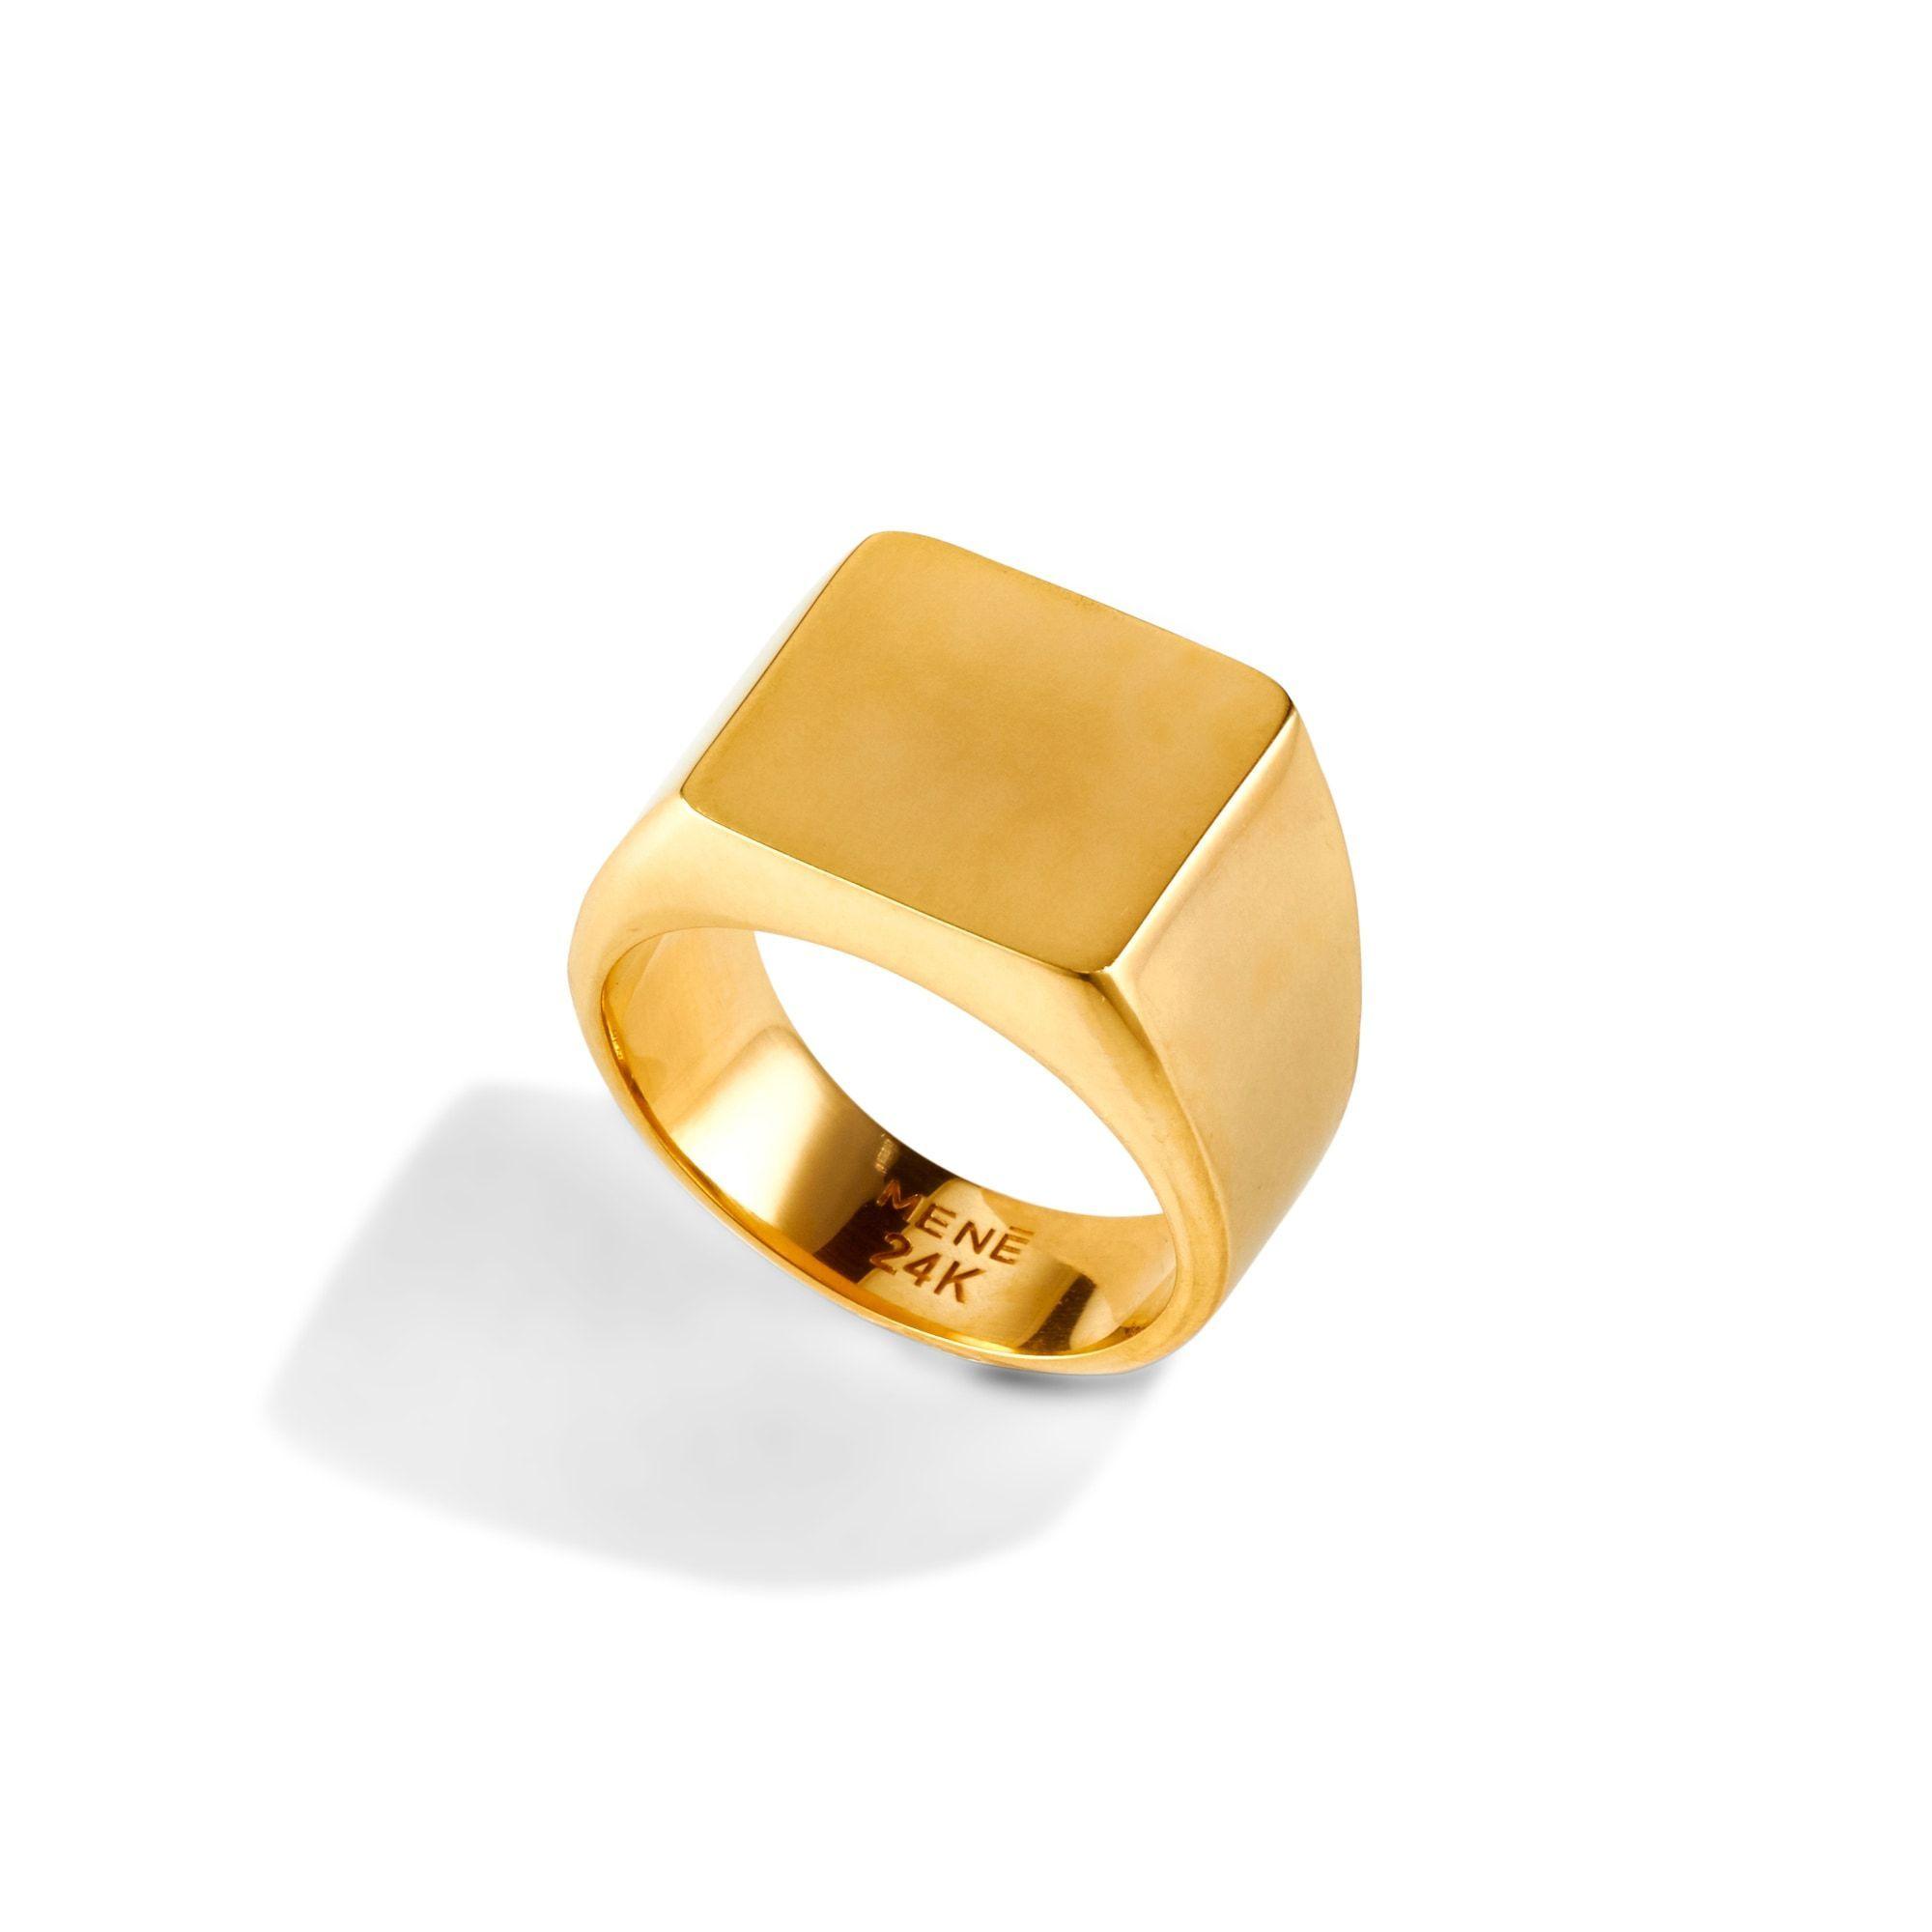 Square Signet Ring Signet Ring Signet Ring Men Signet